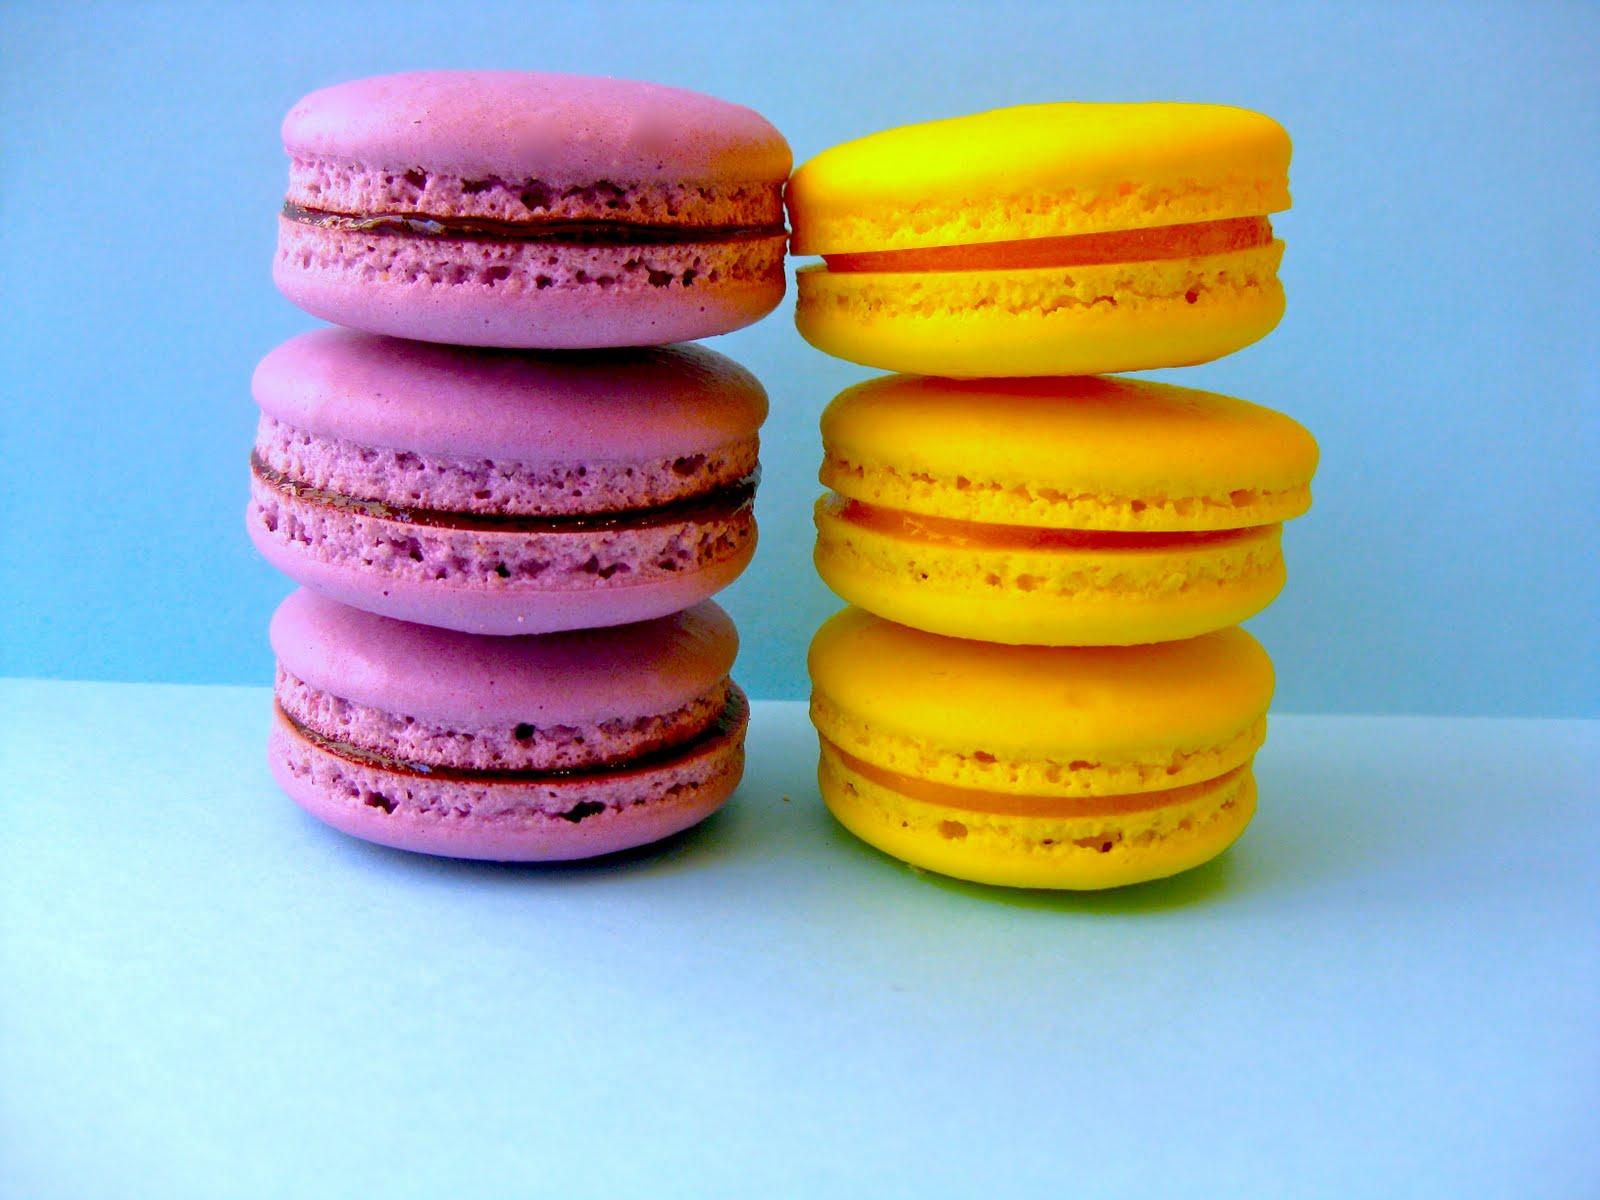 Pixie Crust: Passion Fruit Macarons & Blackberry Macarons